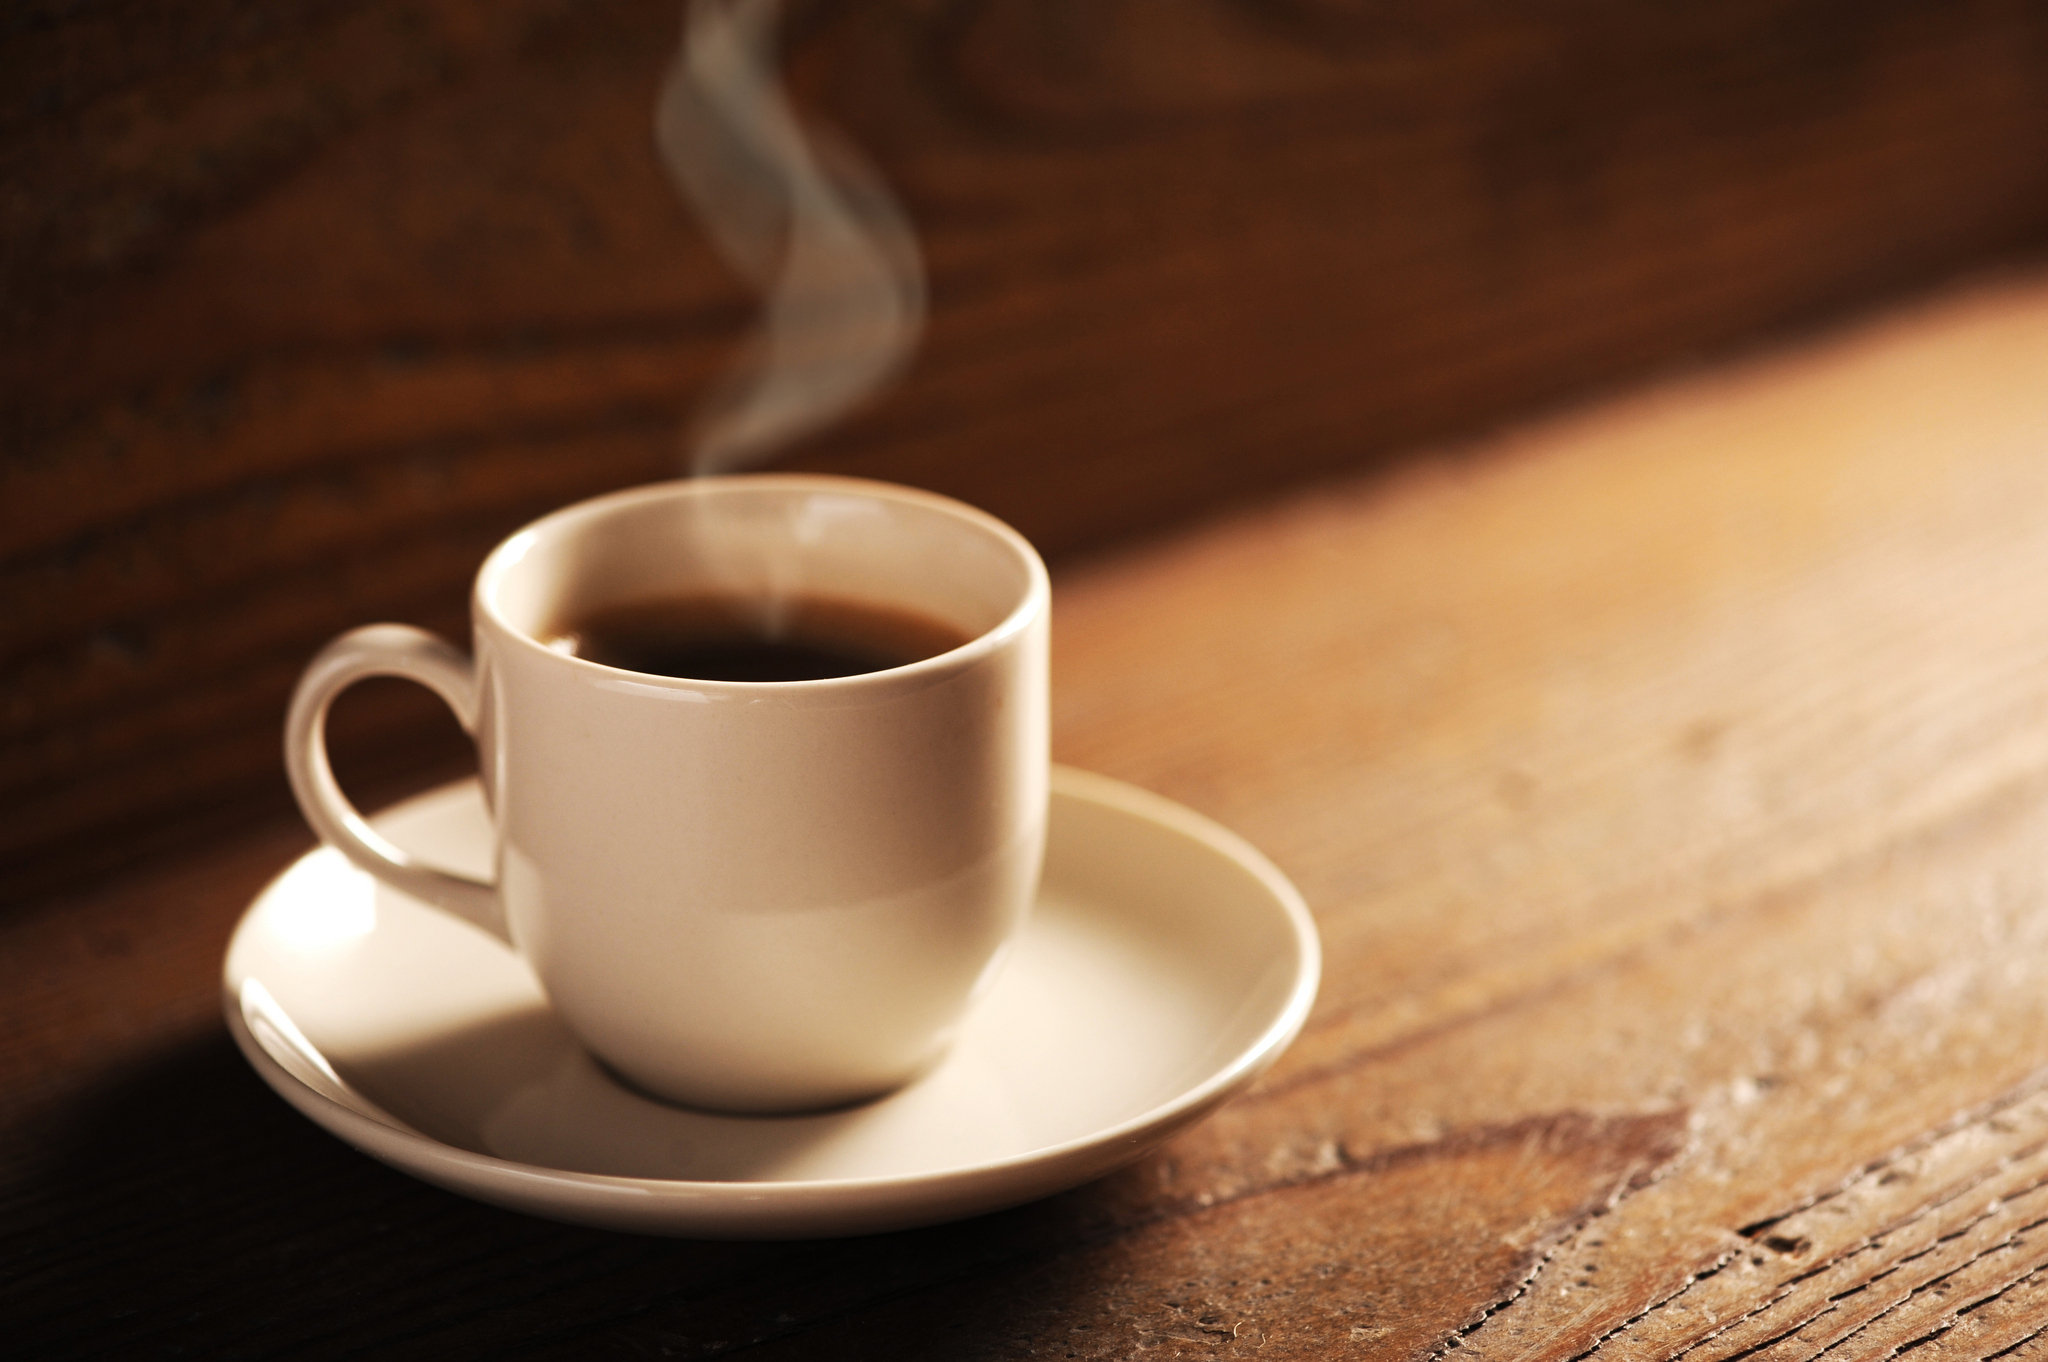 coffee-stock-photo-0e8b300f42157b6f